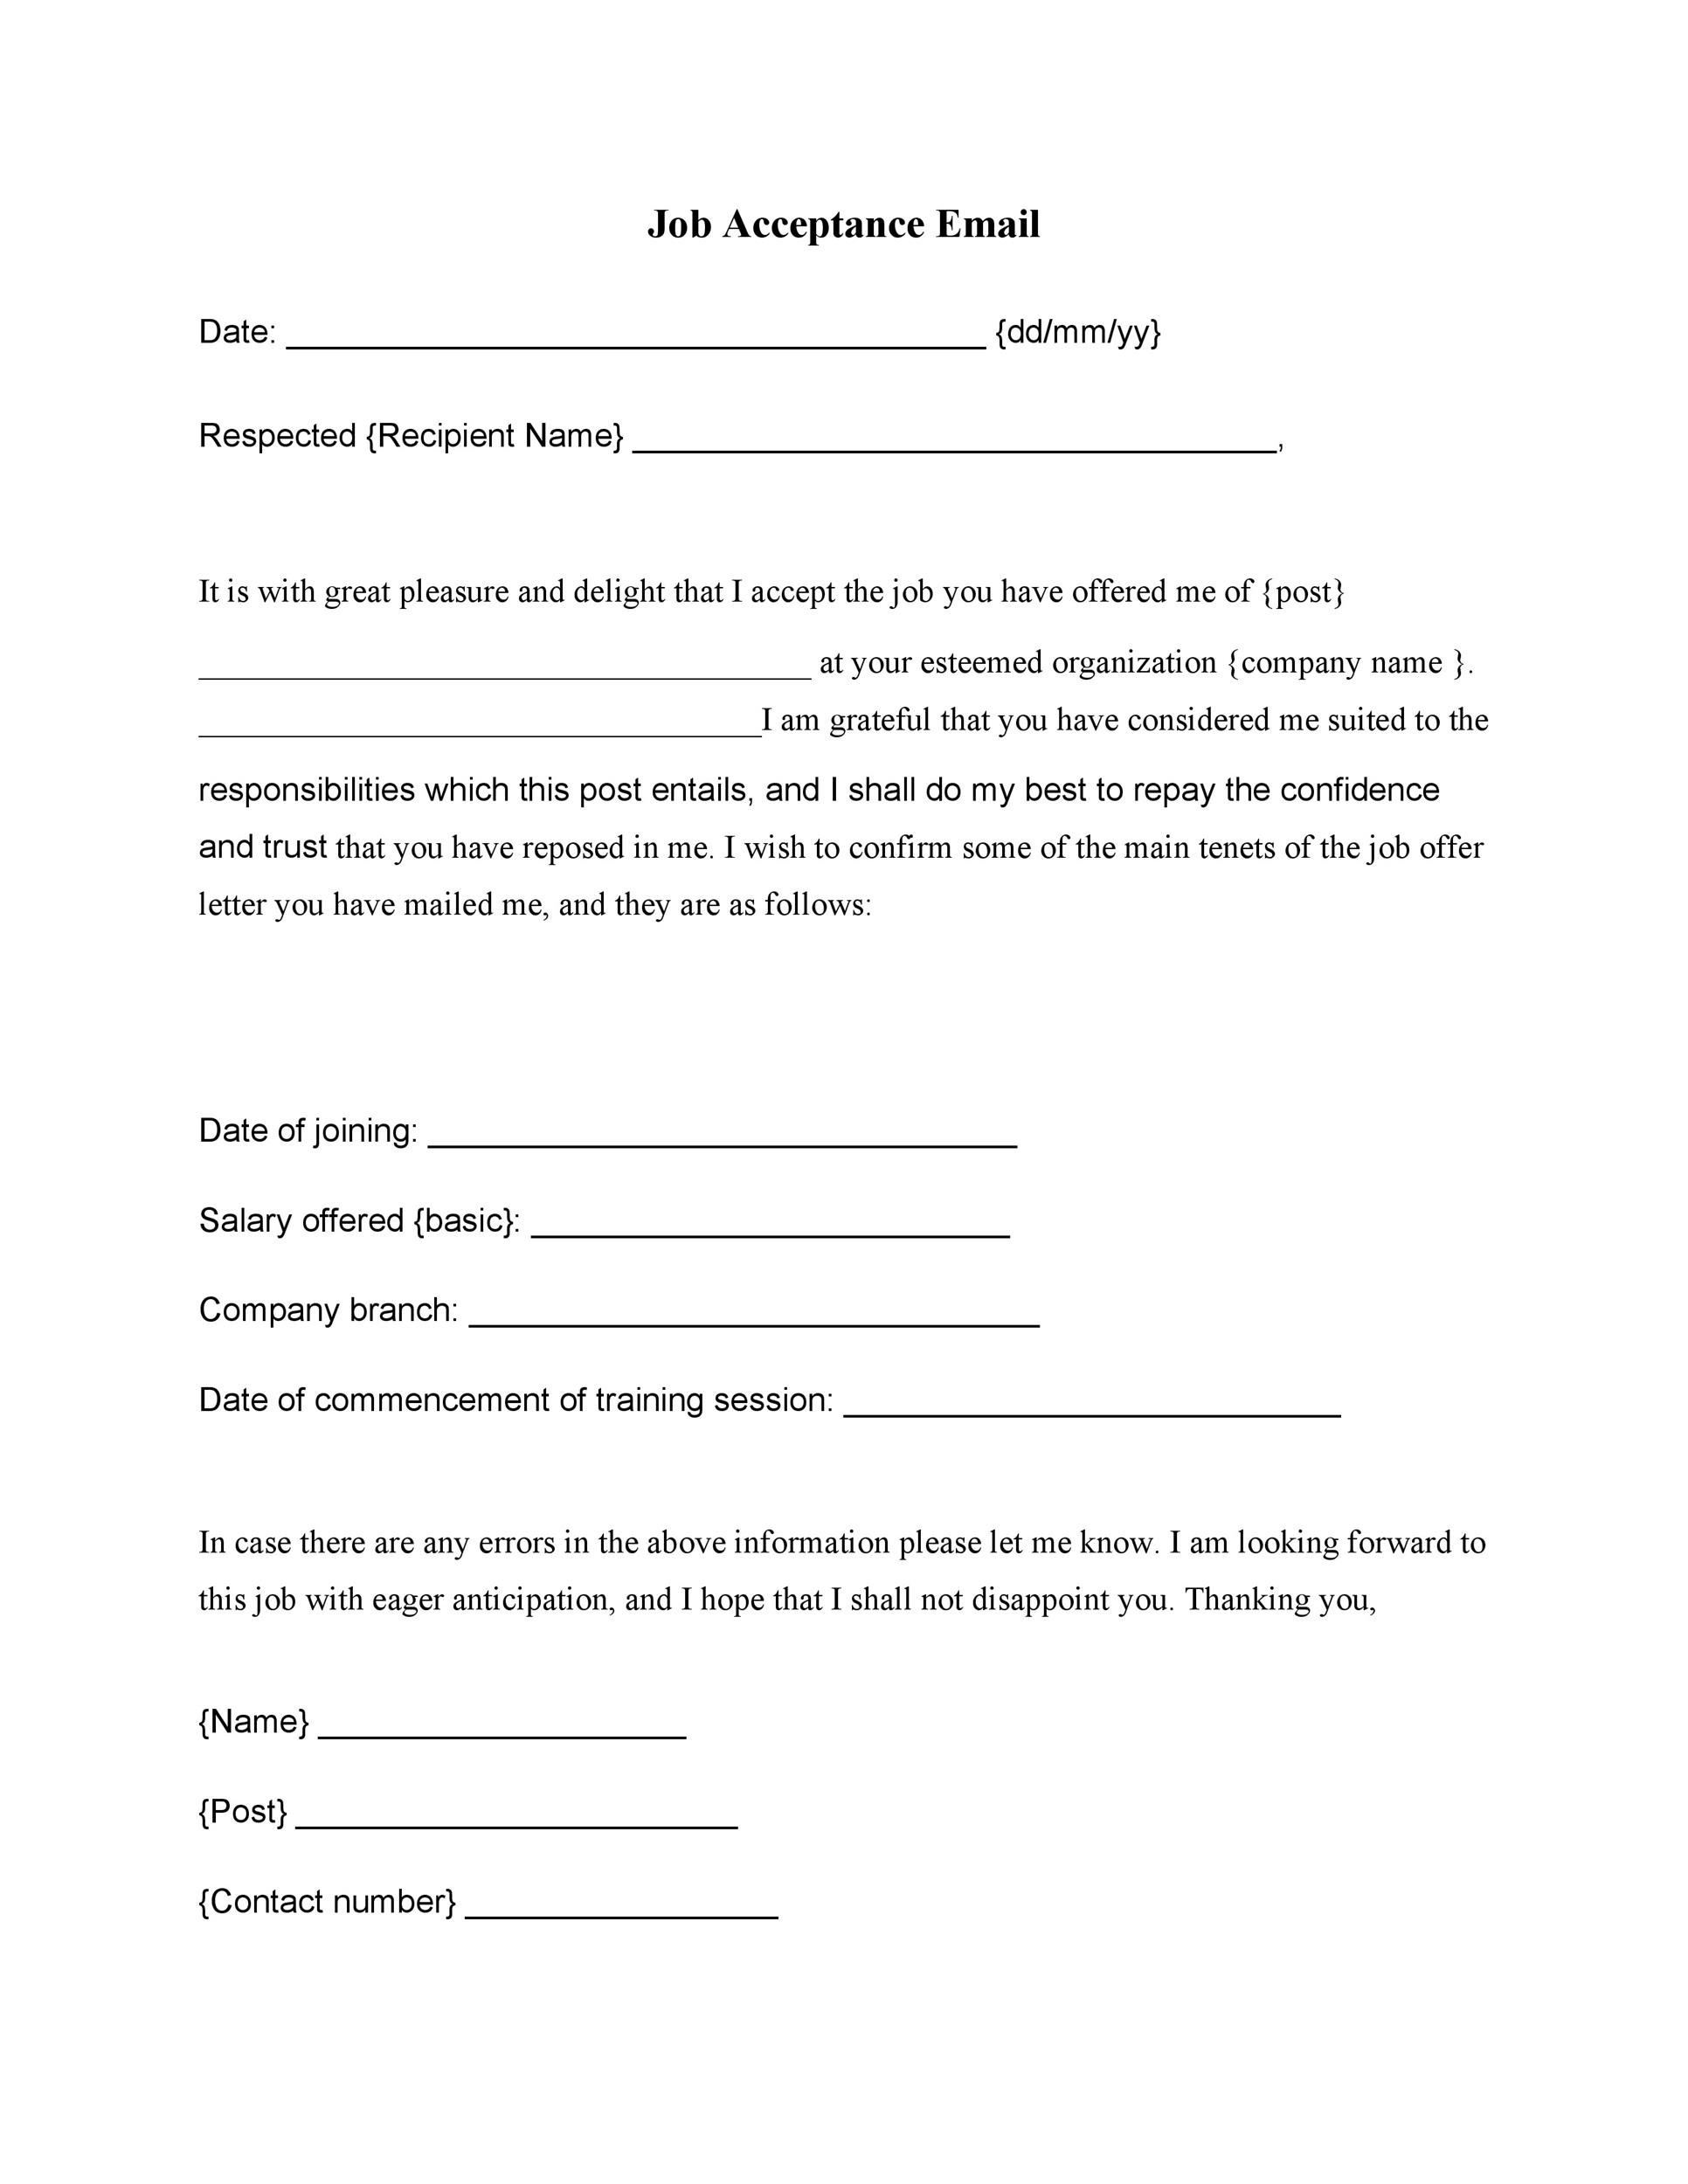 Free job acceptance letter 37